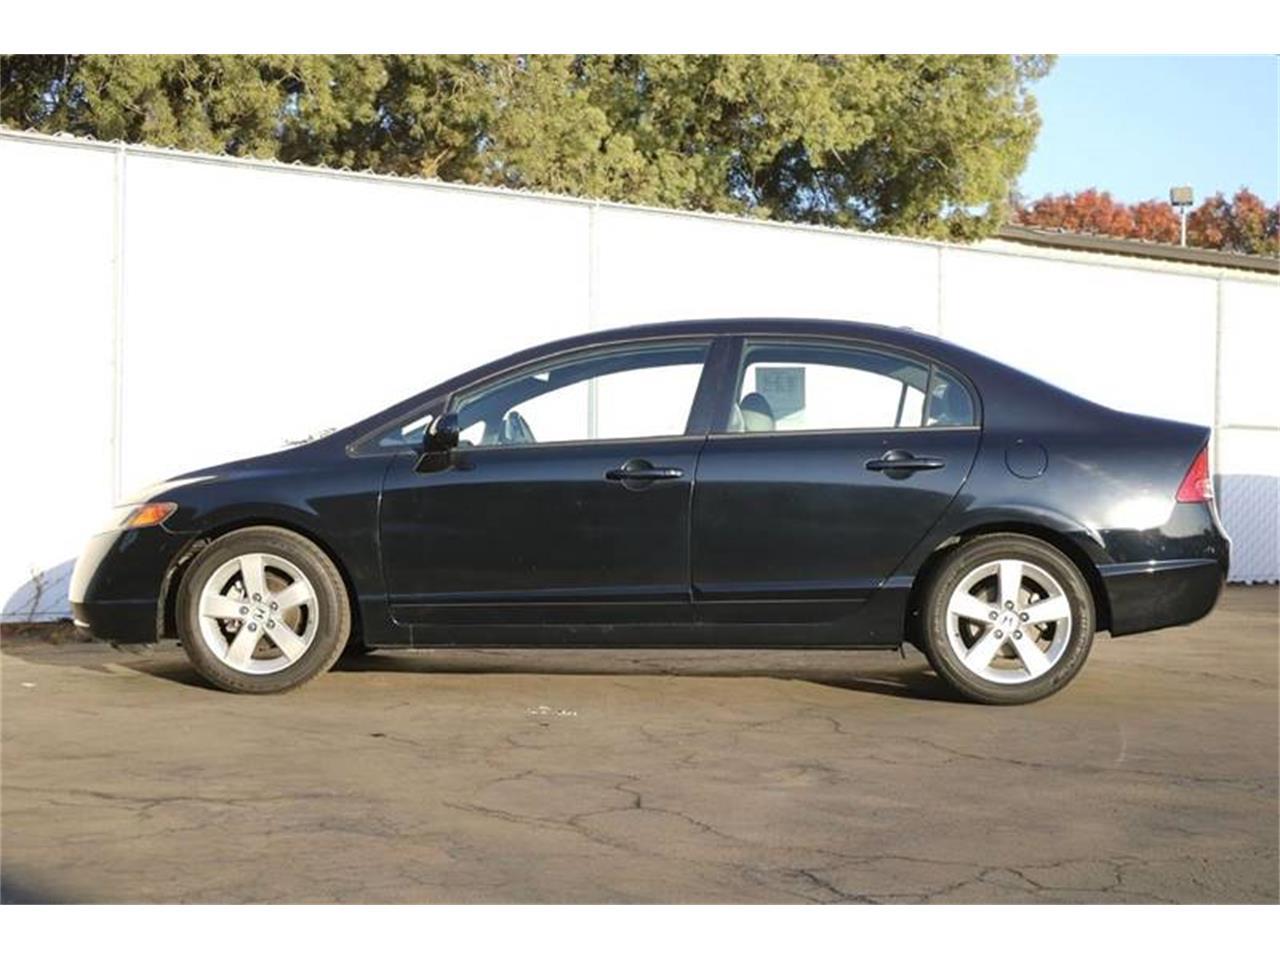 2008 Honda Civic (CC-1310532) for sale in Dinuba, California